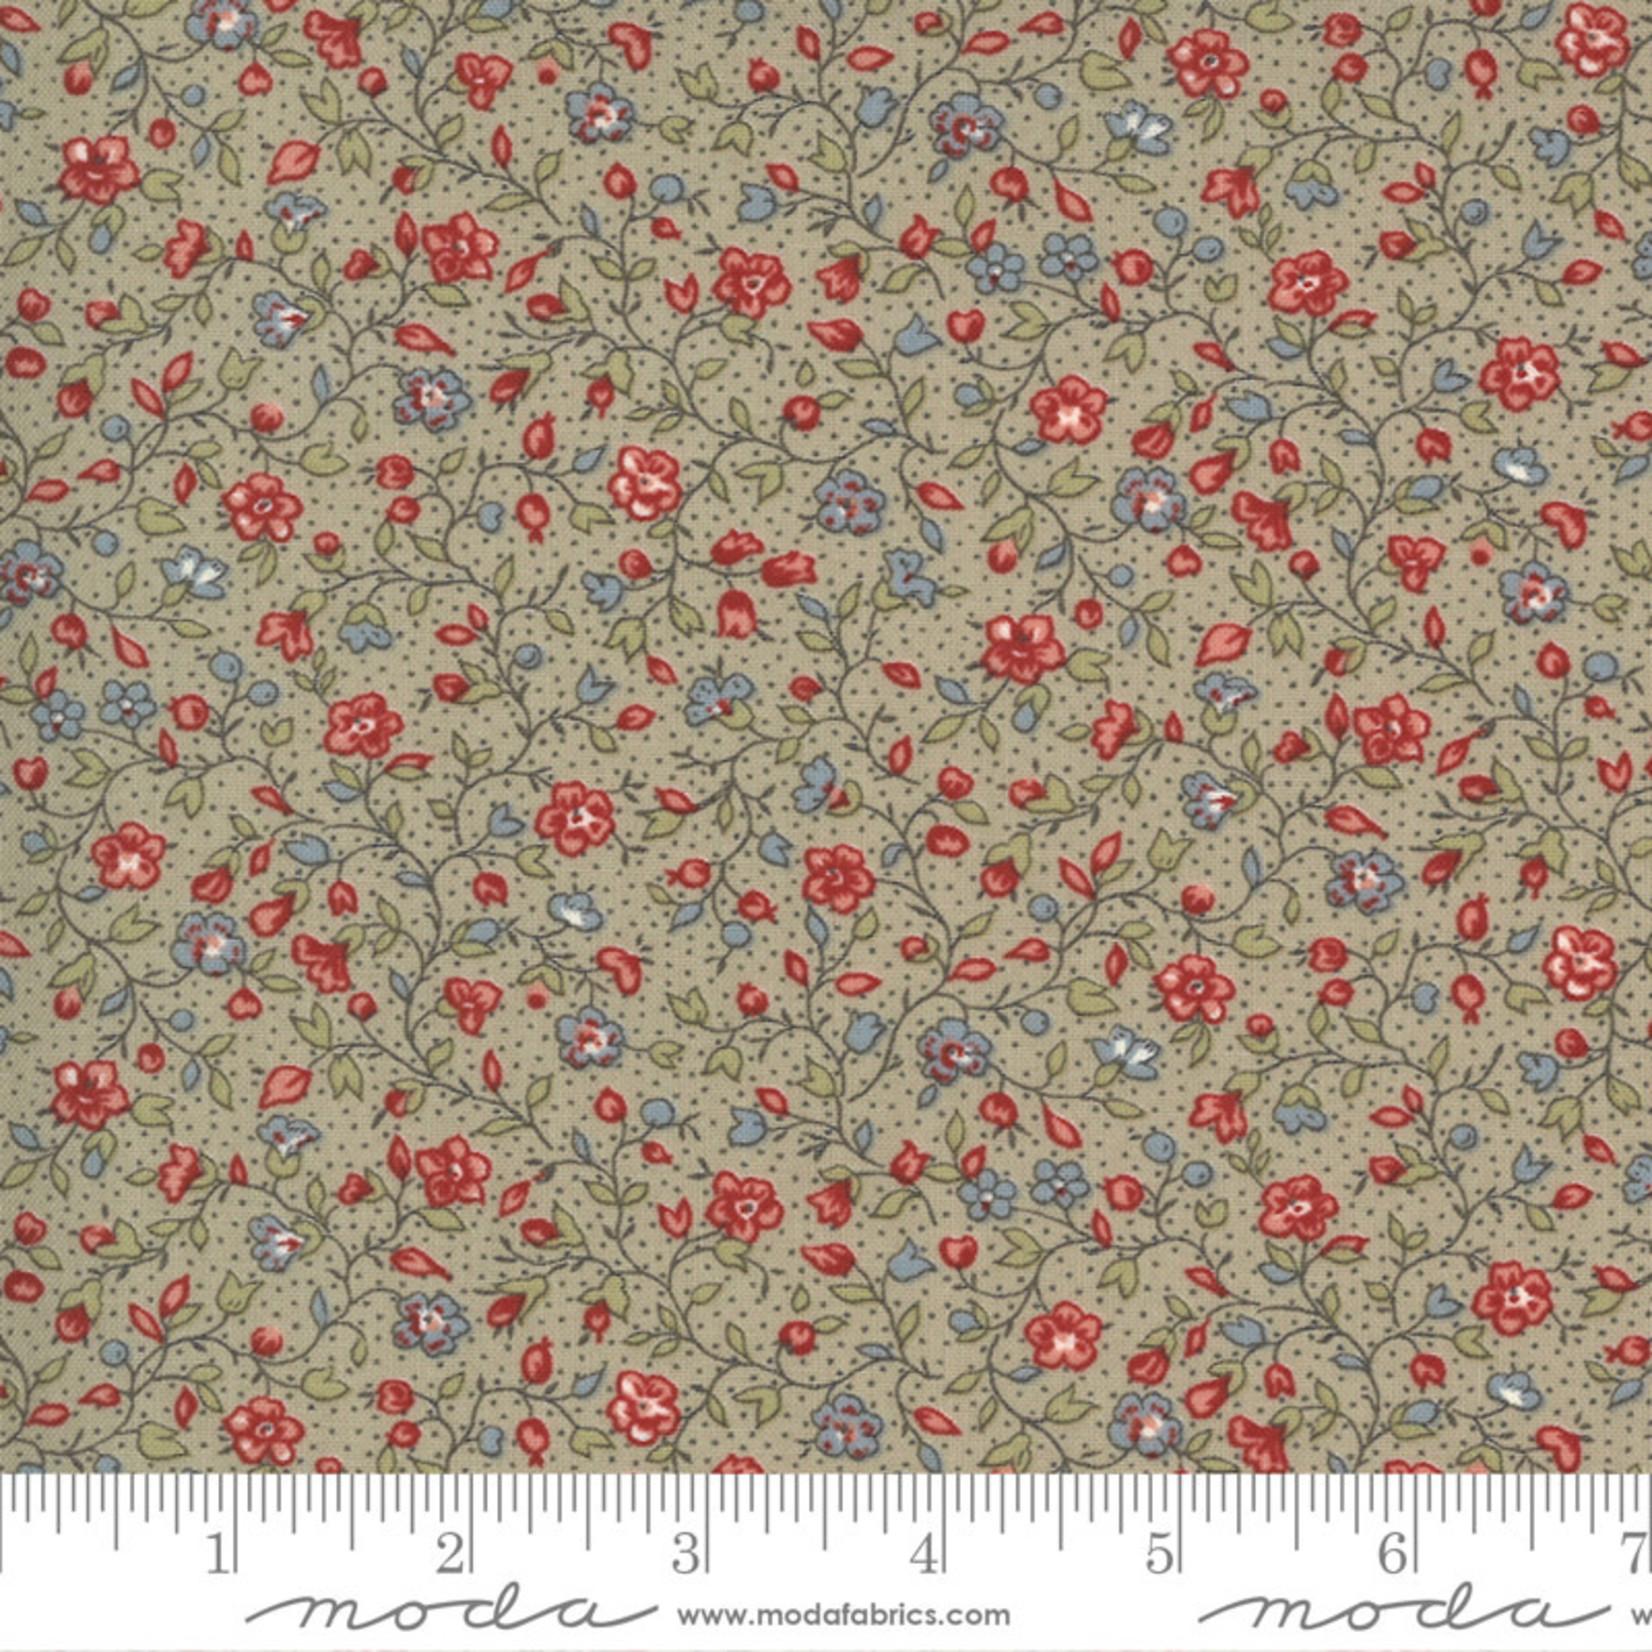 FRENCH GENERAL Jardins De Fleurs, Villandry, Roche 13895-14 $0.20 per cm or $20/m